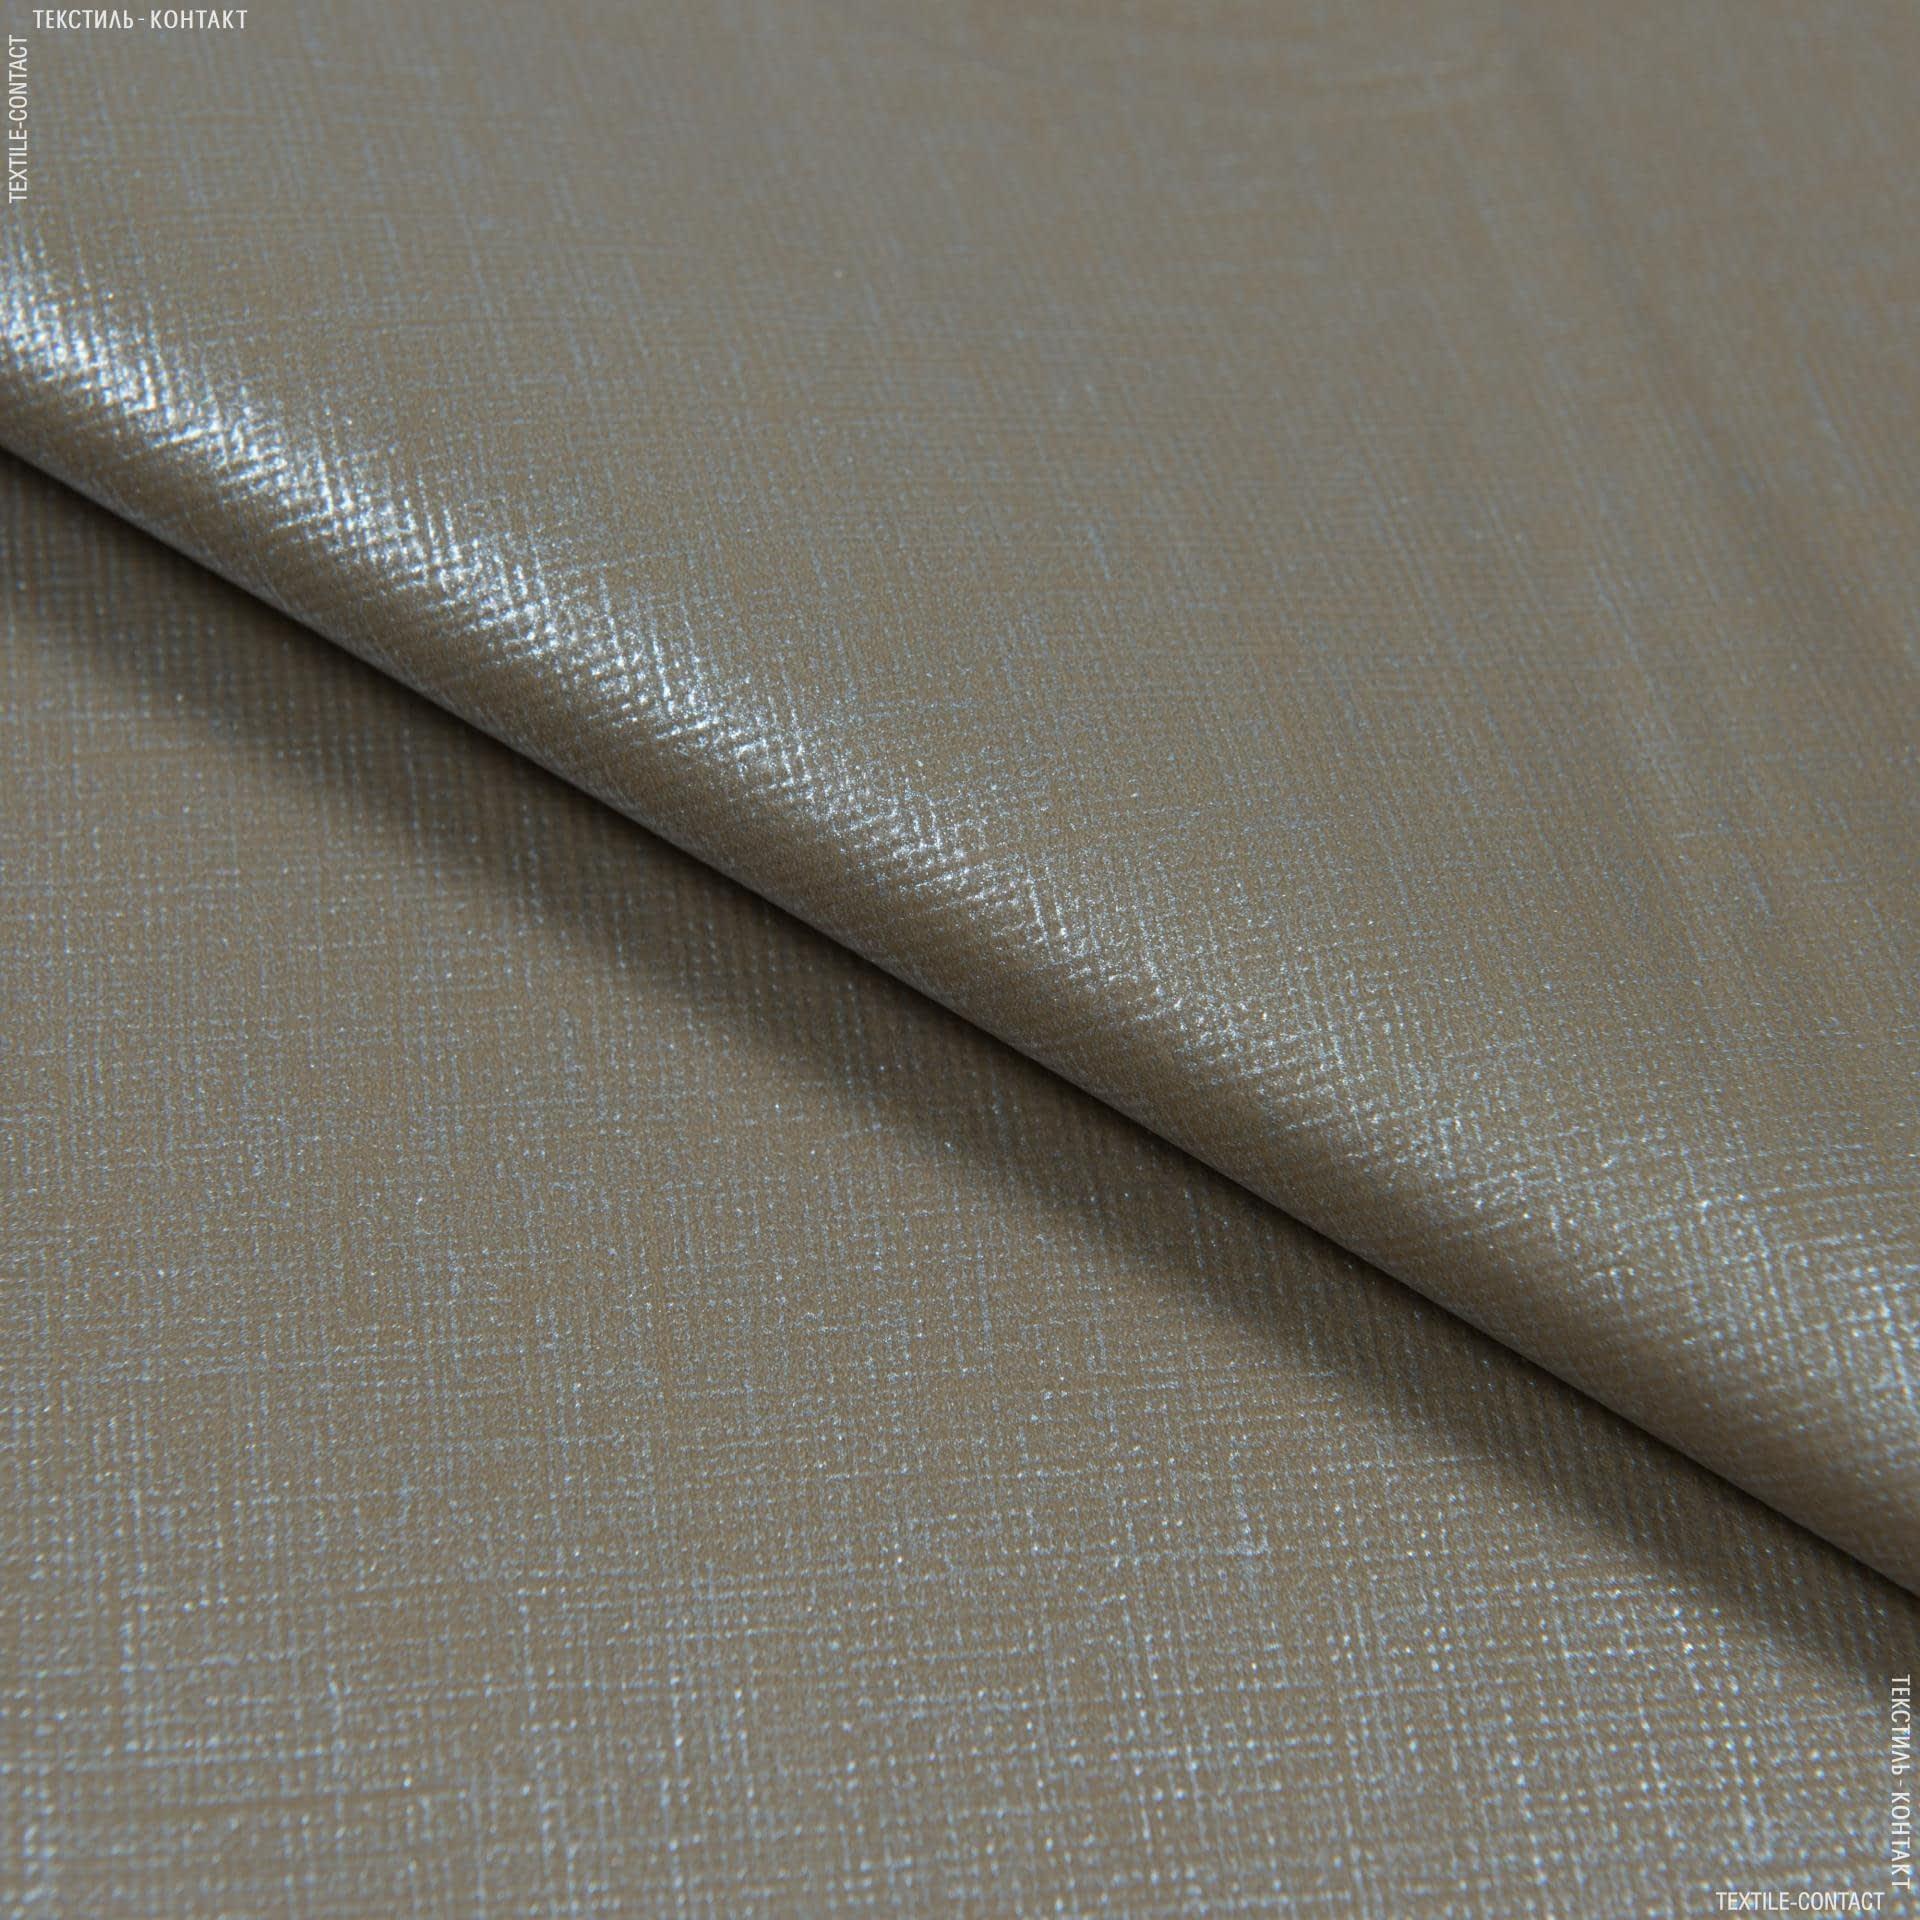 Ткани horeca - Скатертная пленка мантелериа хаки-серебро